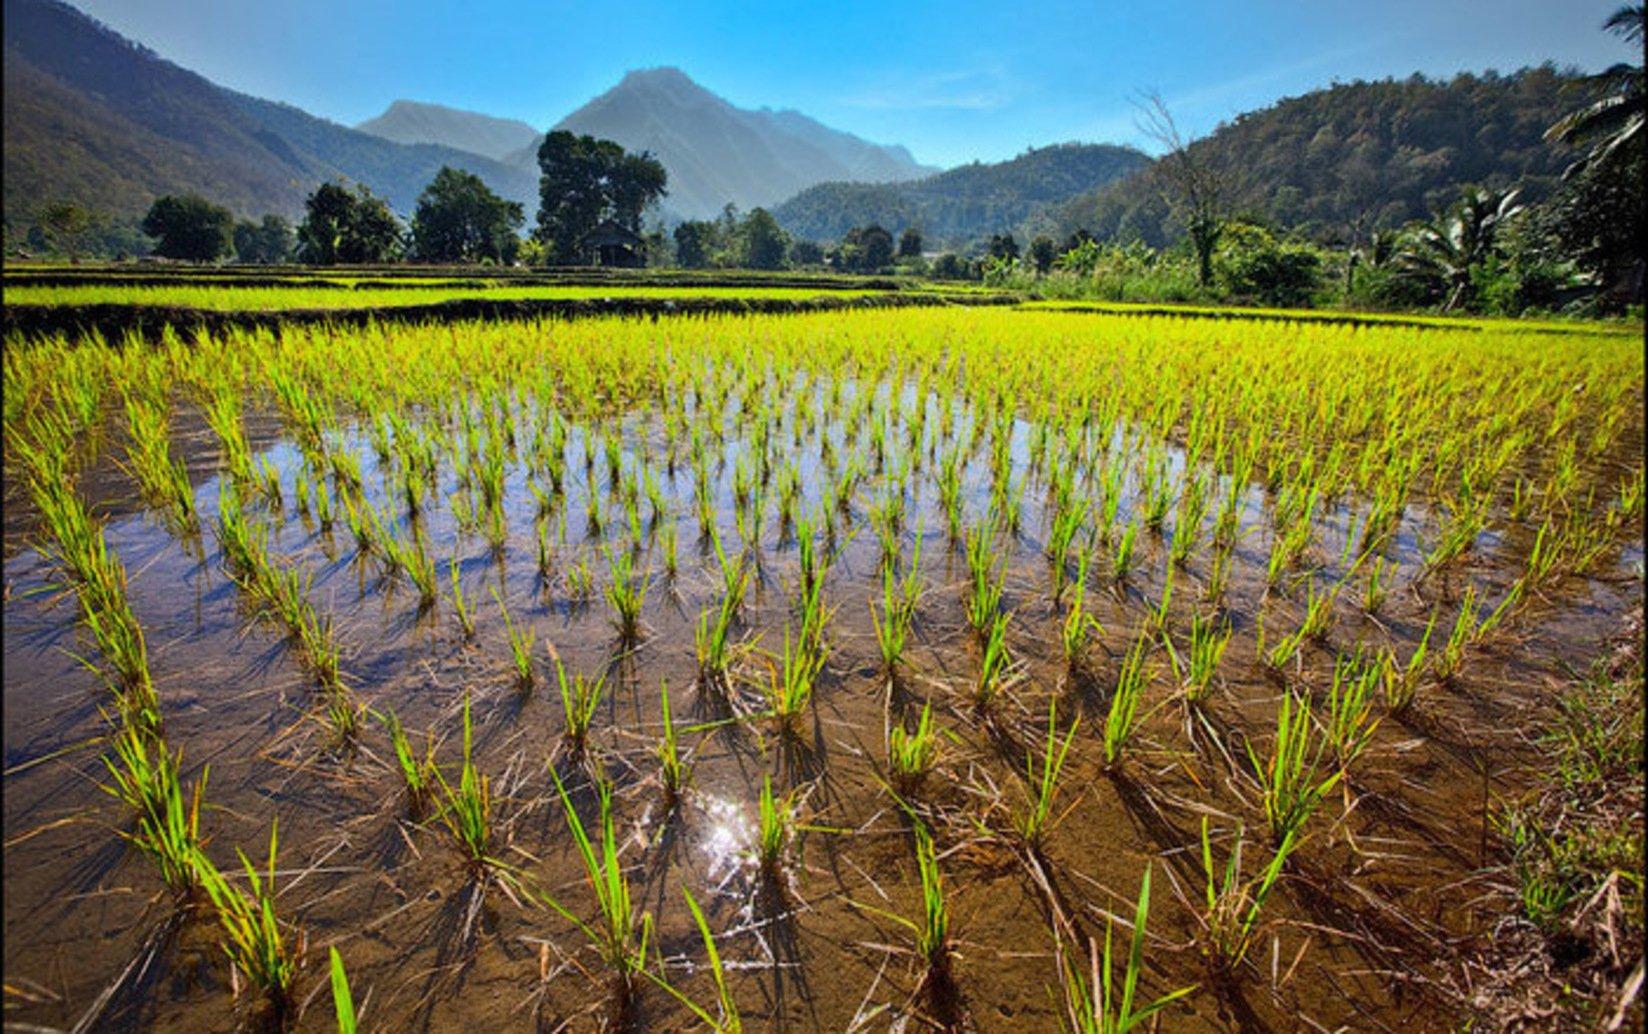 ВИспании вырастили лекарство отВИЧ нарисовой плантации